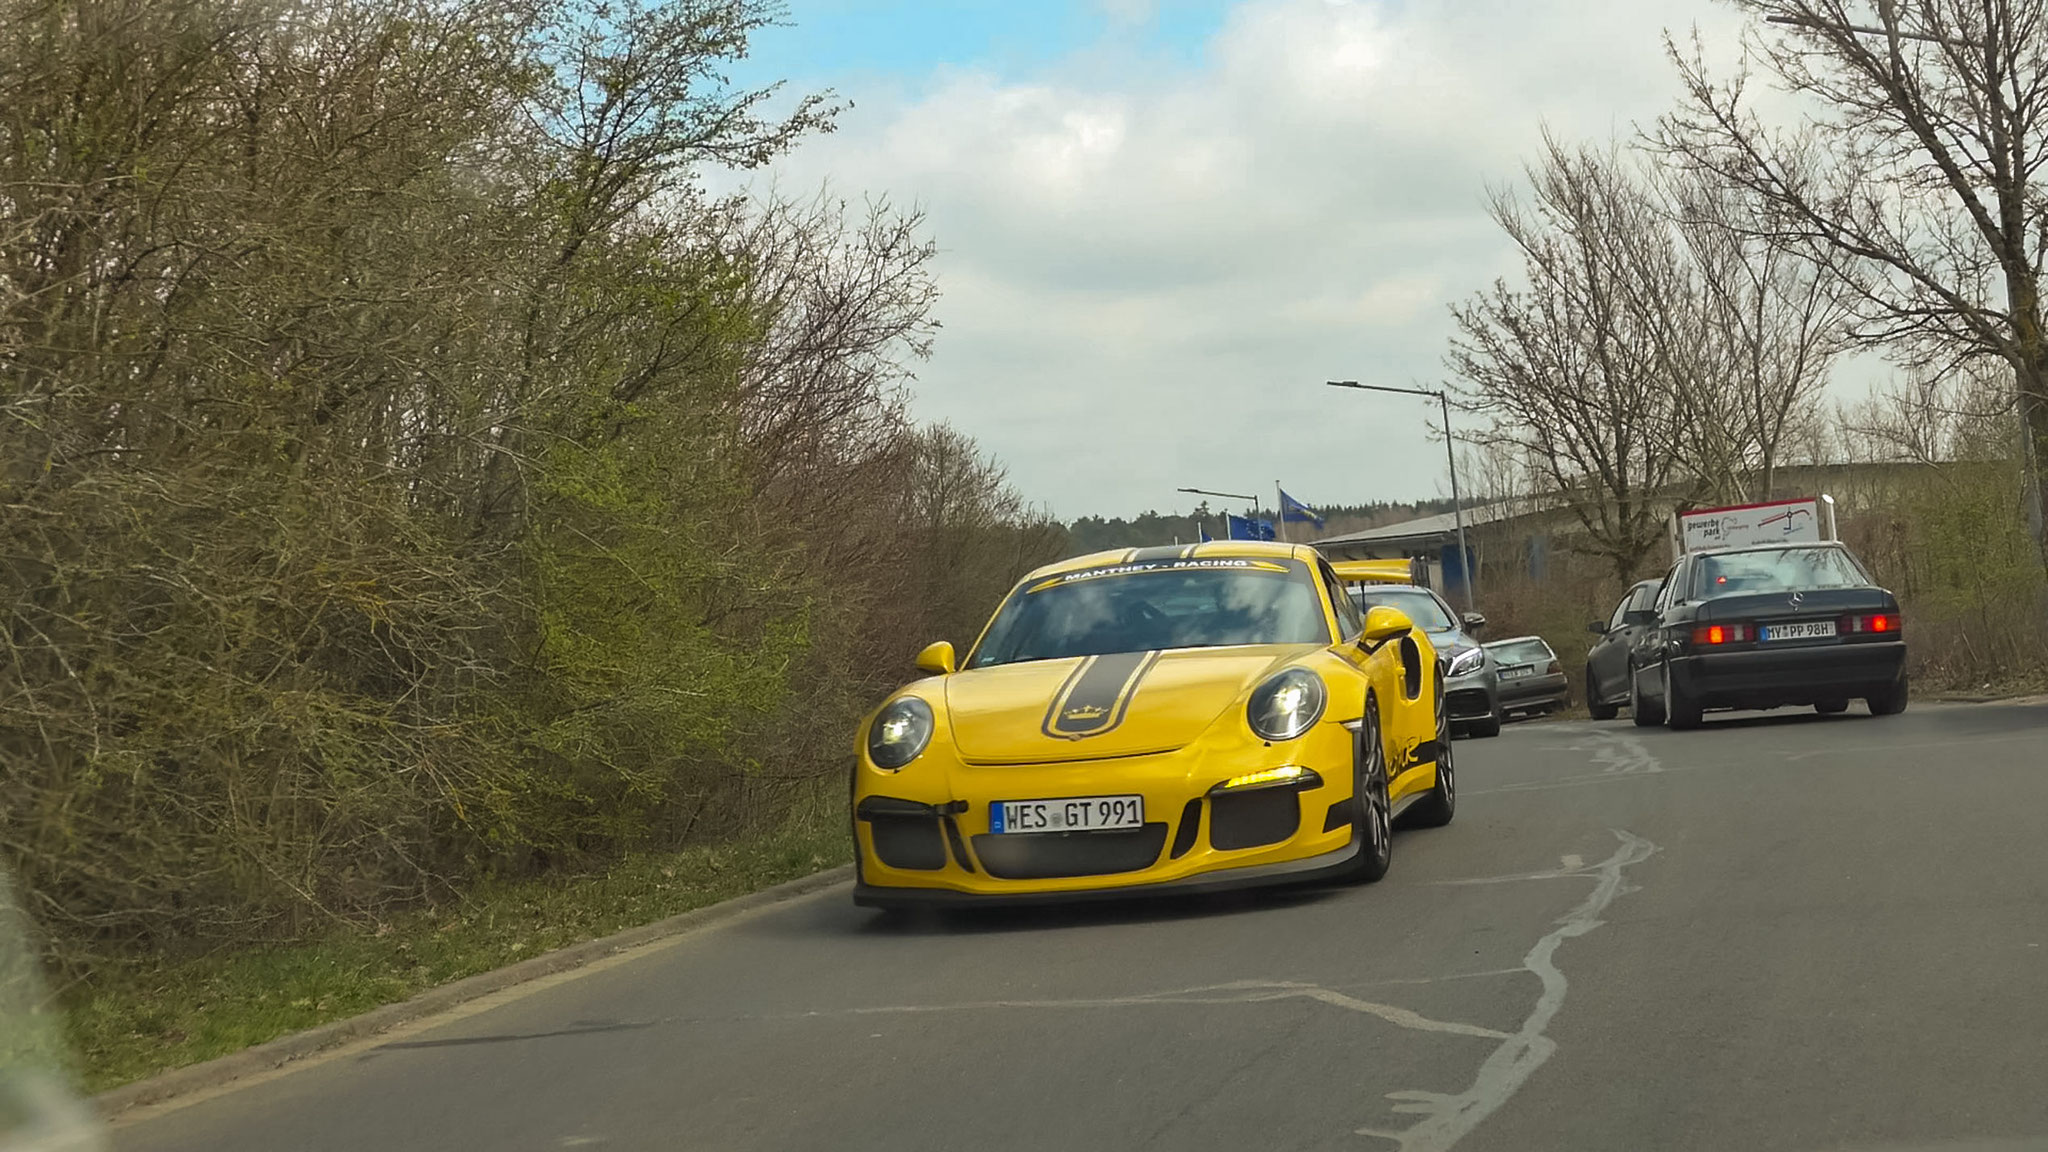 Porsche 911 GT3 RS - WES-GT-991